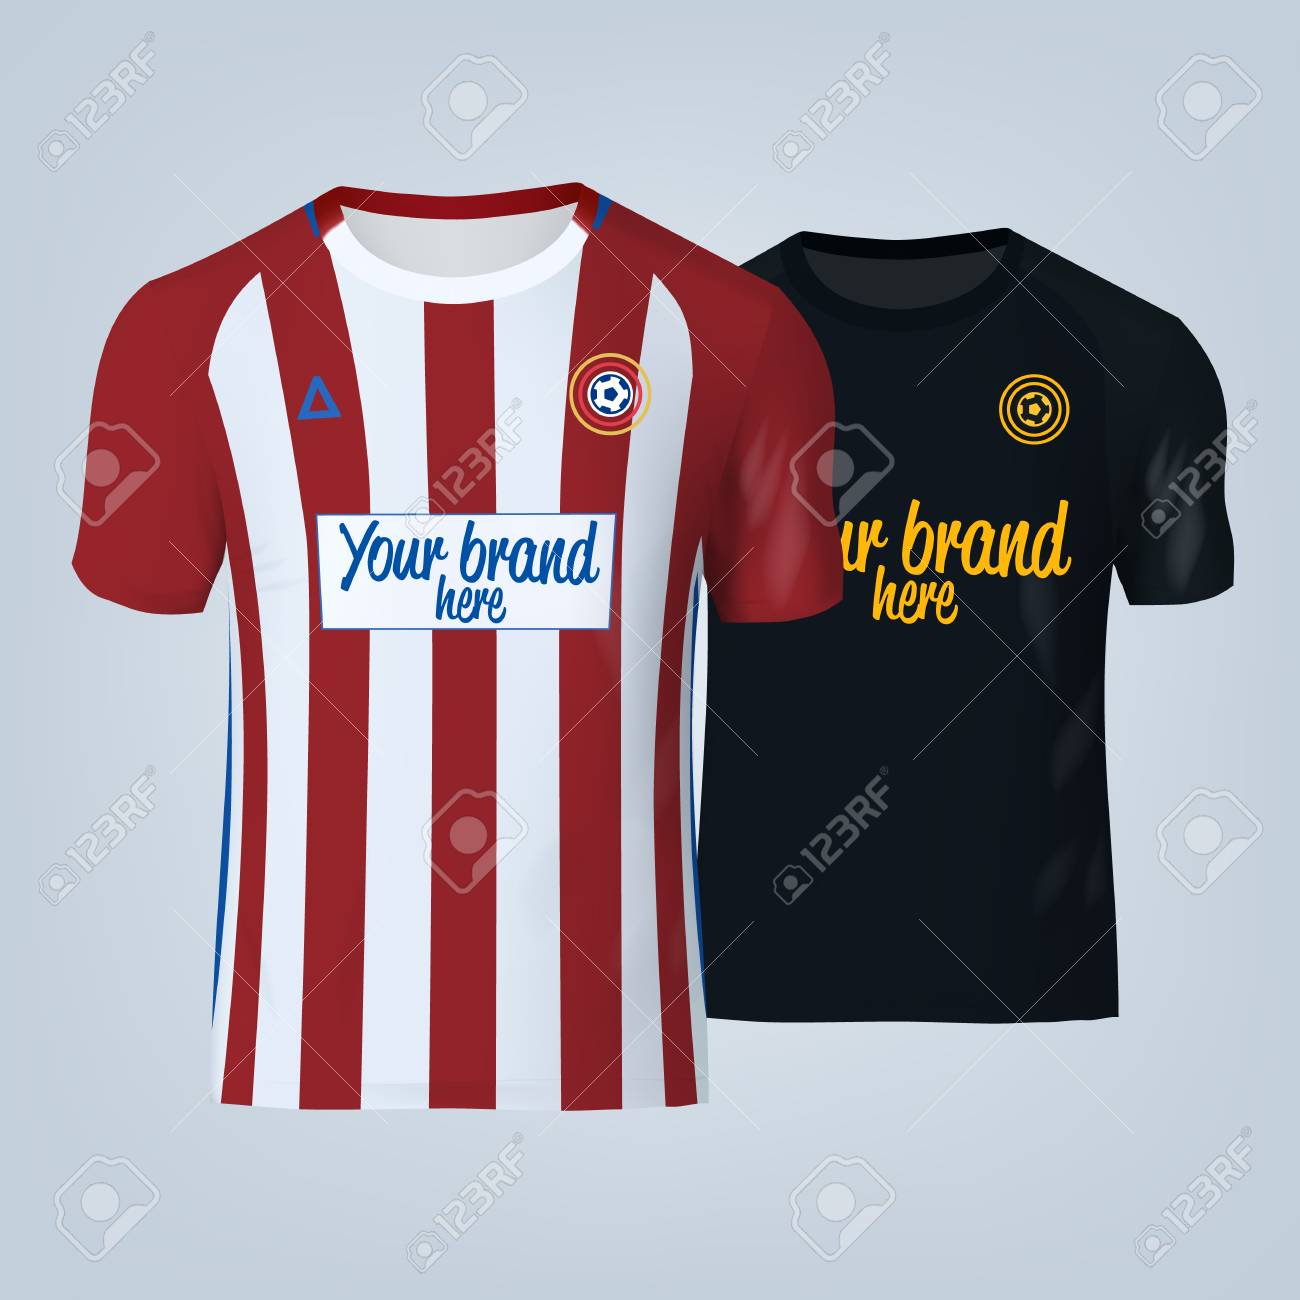 Vector illustration of football t-shirt template. - 84012292